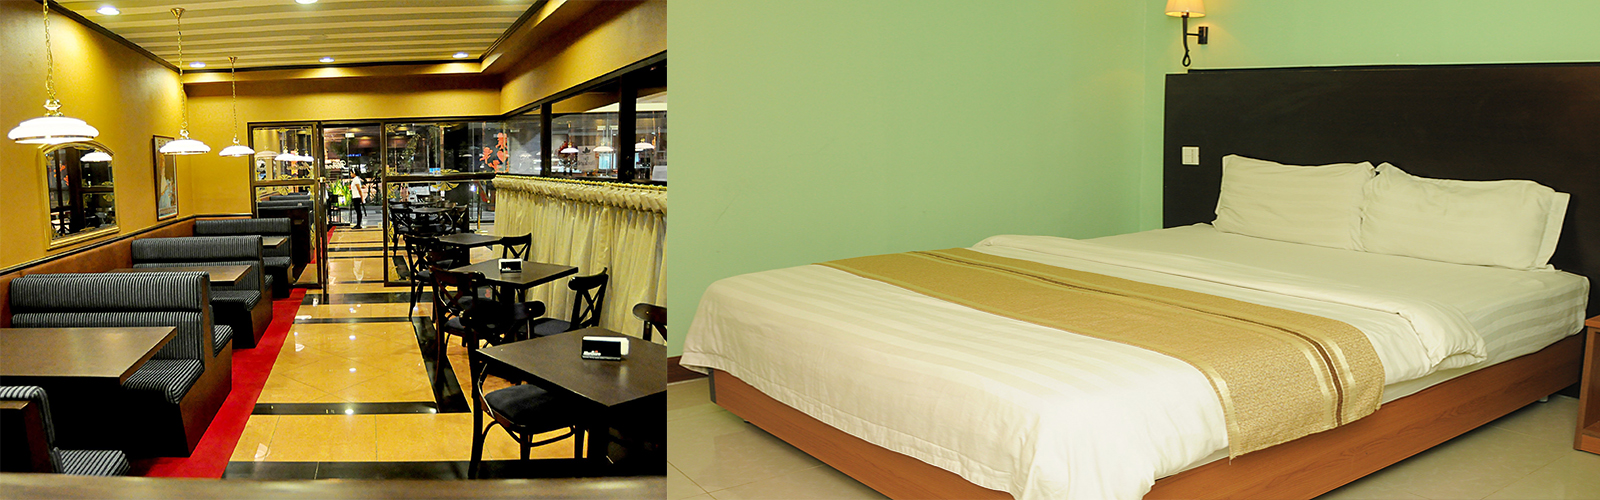 http://cebucia.edu.vn/wp-content/uploads/2015/10/arabfiles/giuong-ngu-Orchard-Hotel.jpg